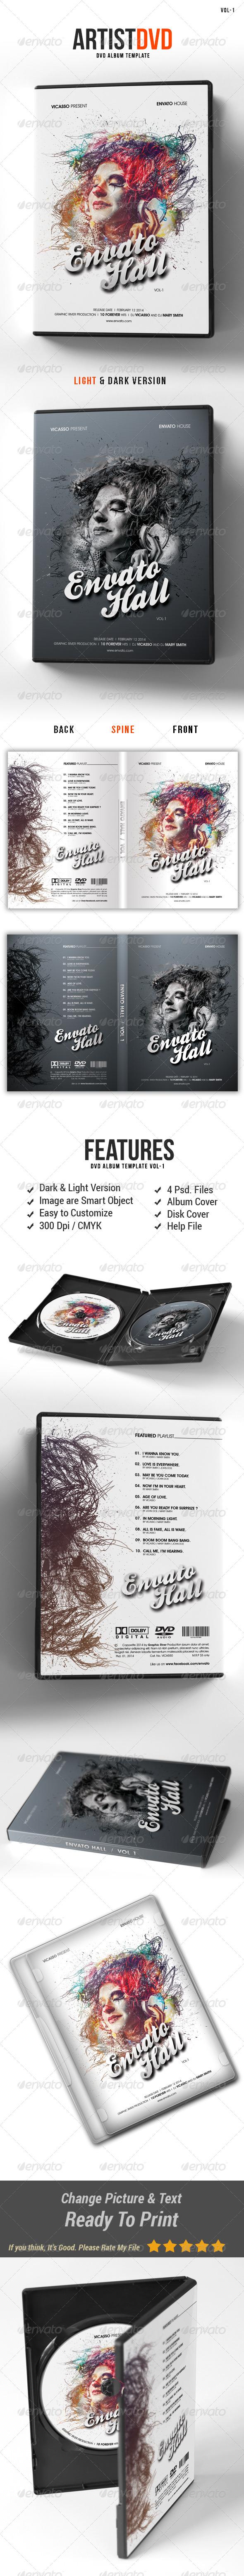 GraphicRiver Artist DVD 7906770